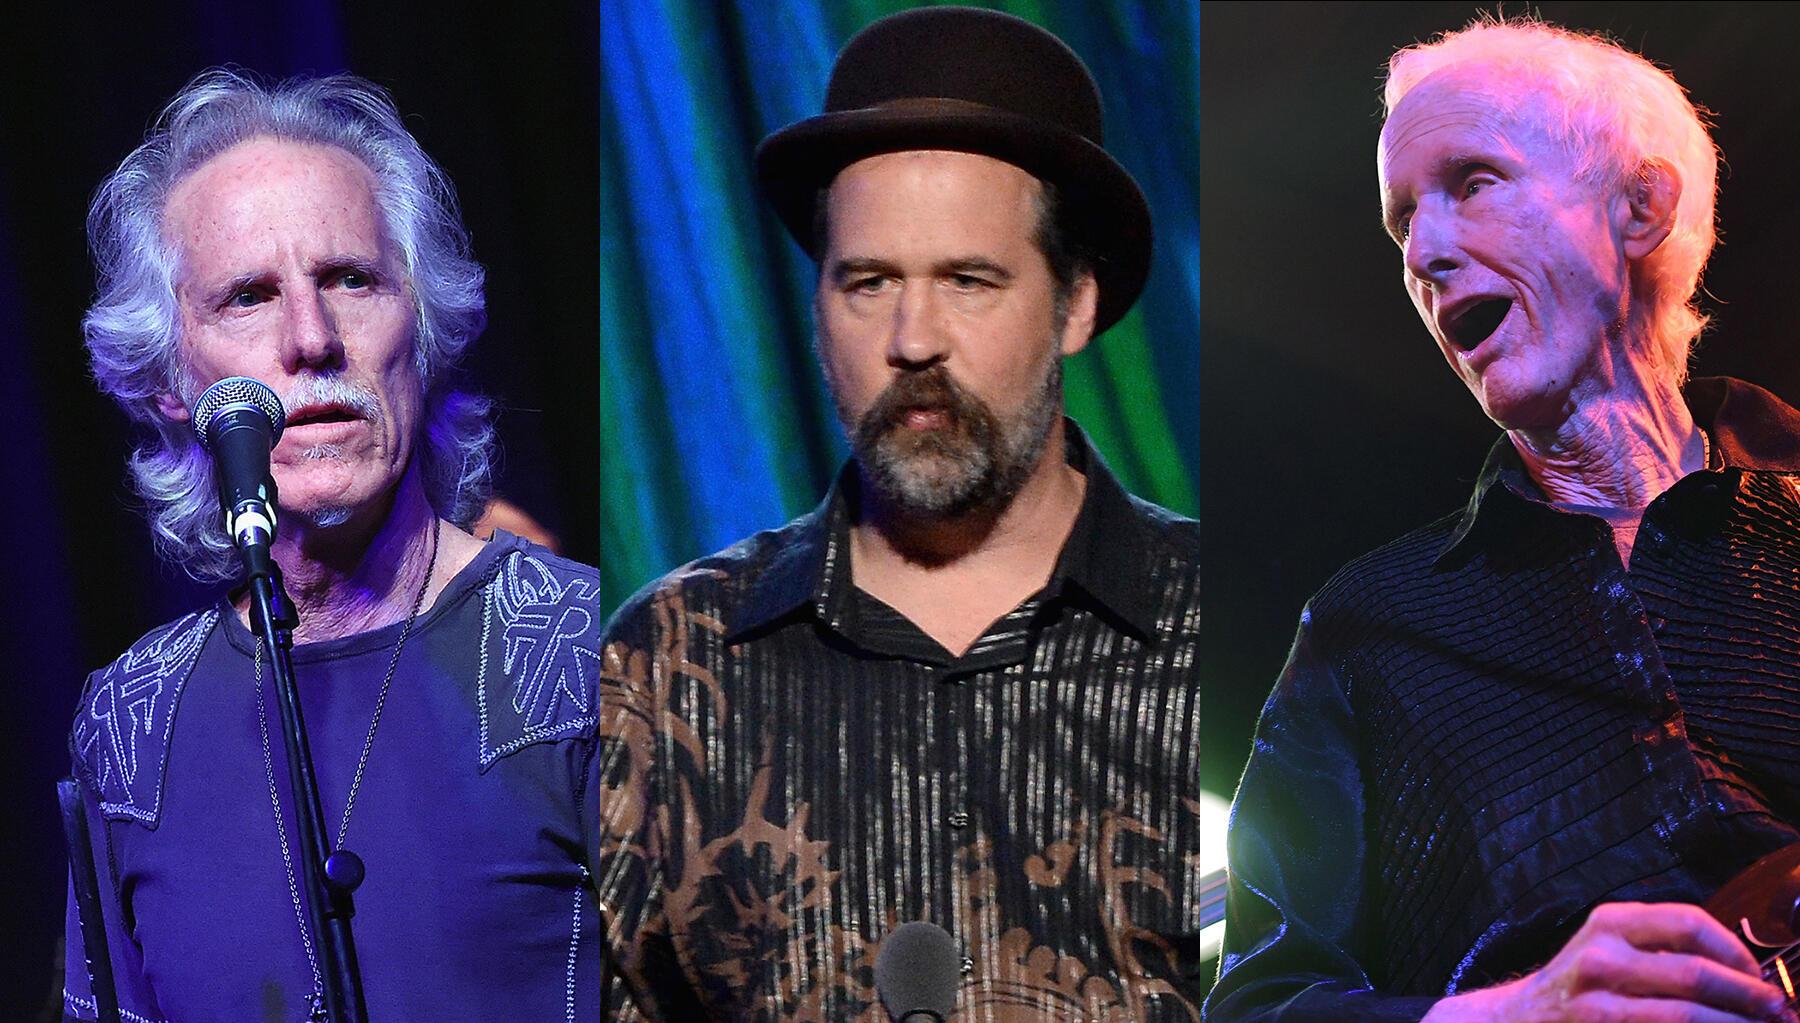 Surviving Members Of The Doors Prepare Set With Nirvana's Krist Novoselic